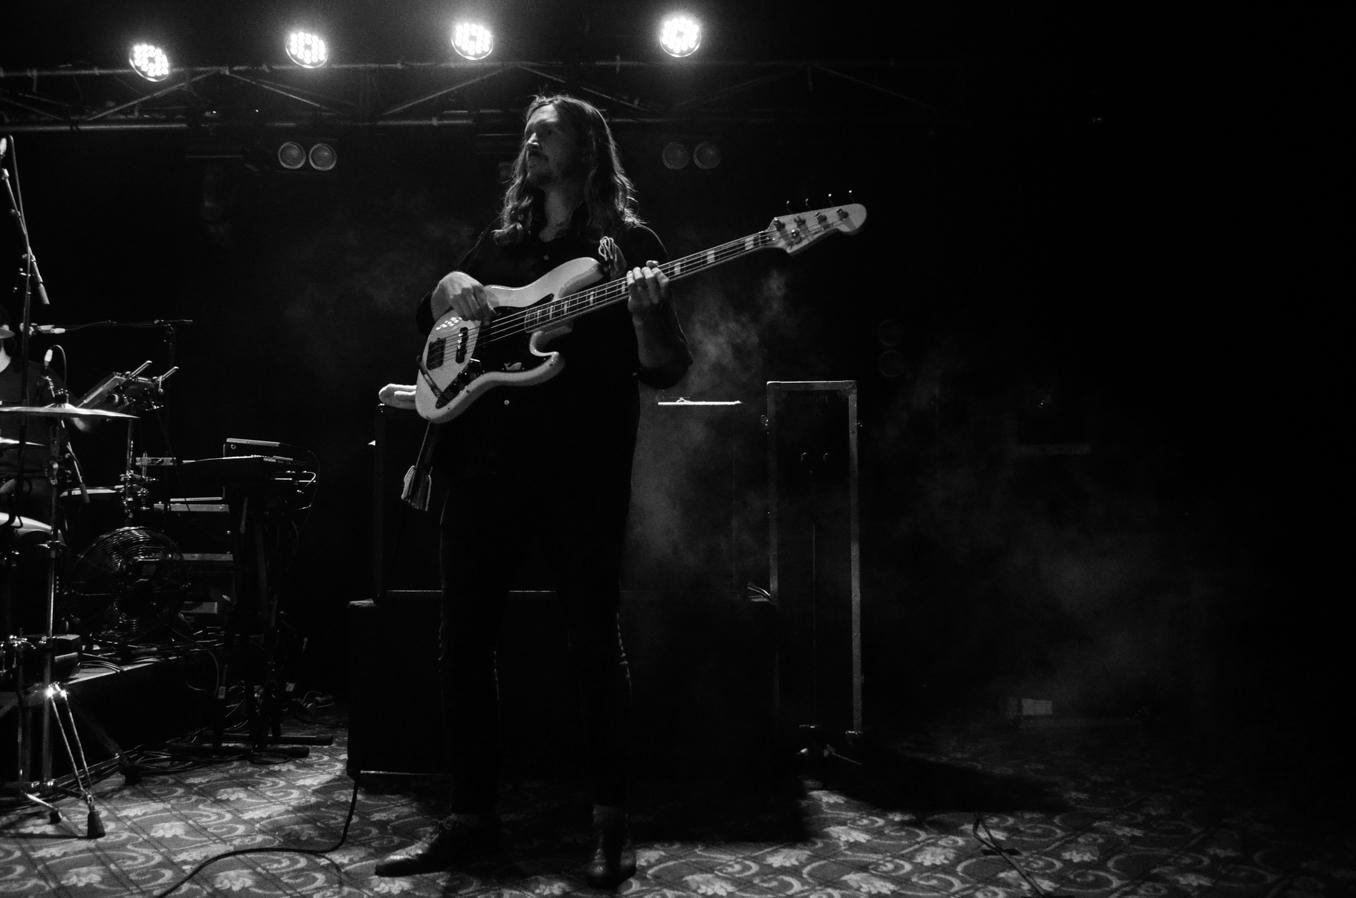 the temper trap music live review photo credit ryley clarke savage thrills savagethrills 2